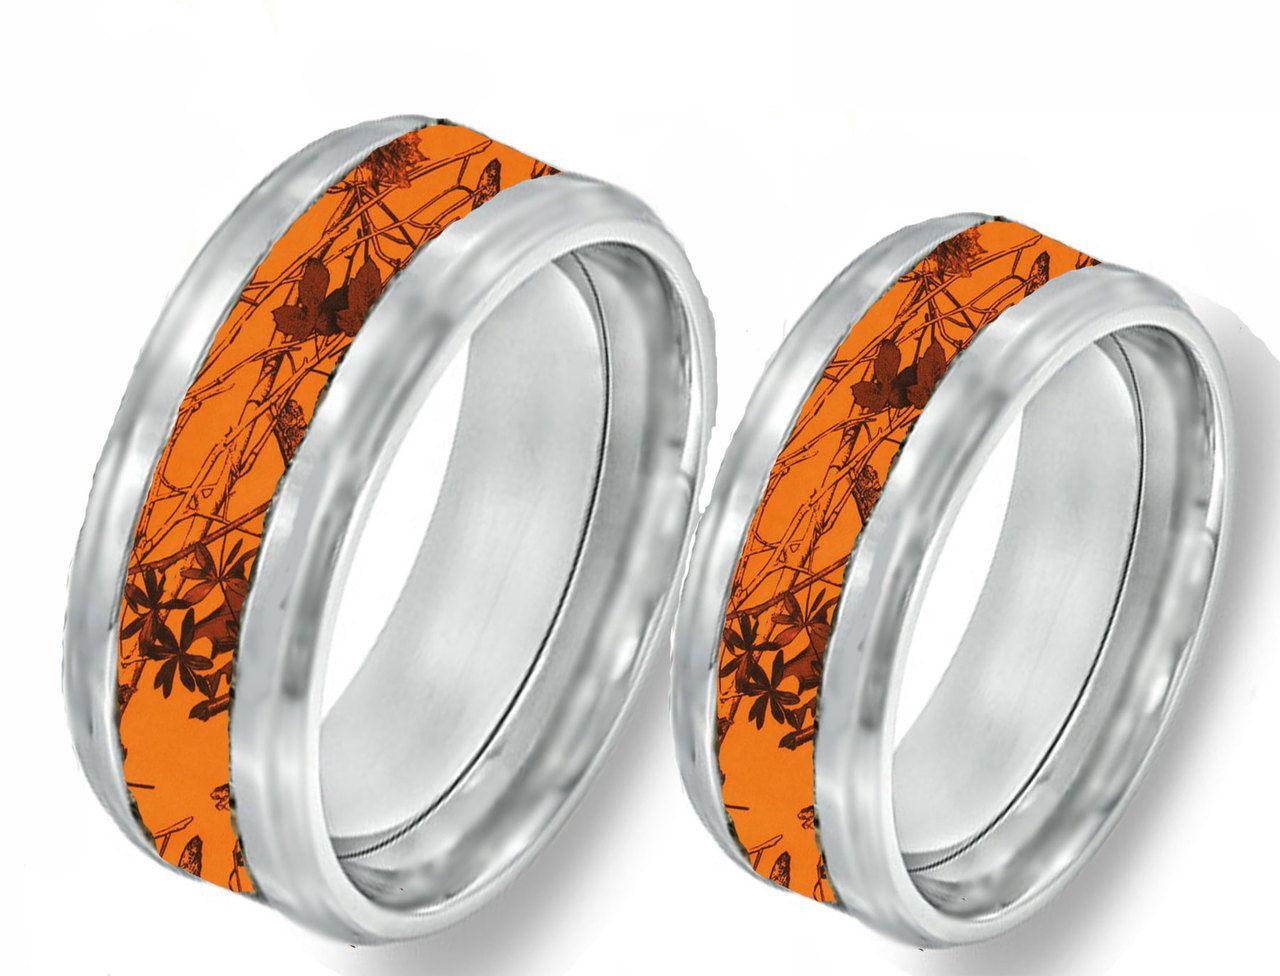 camo wedding band sets Orange Camo Band Couples Ring Set